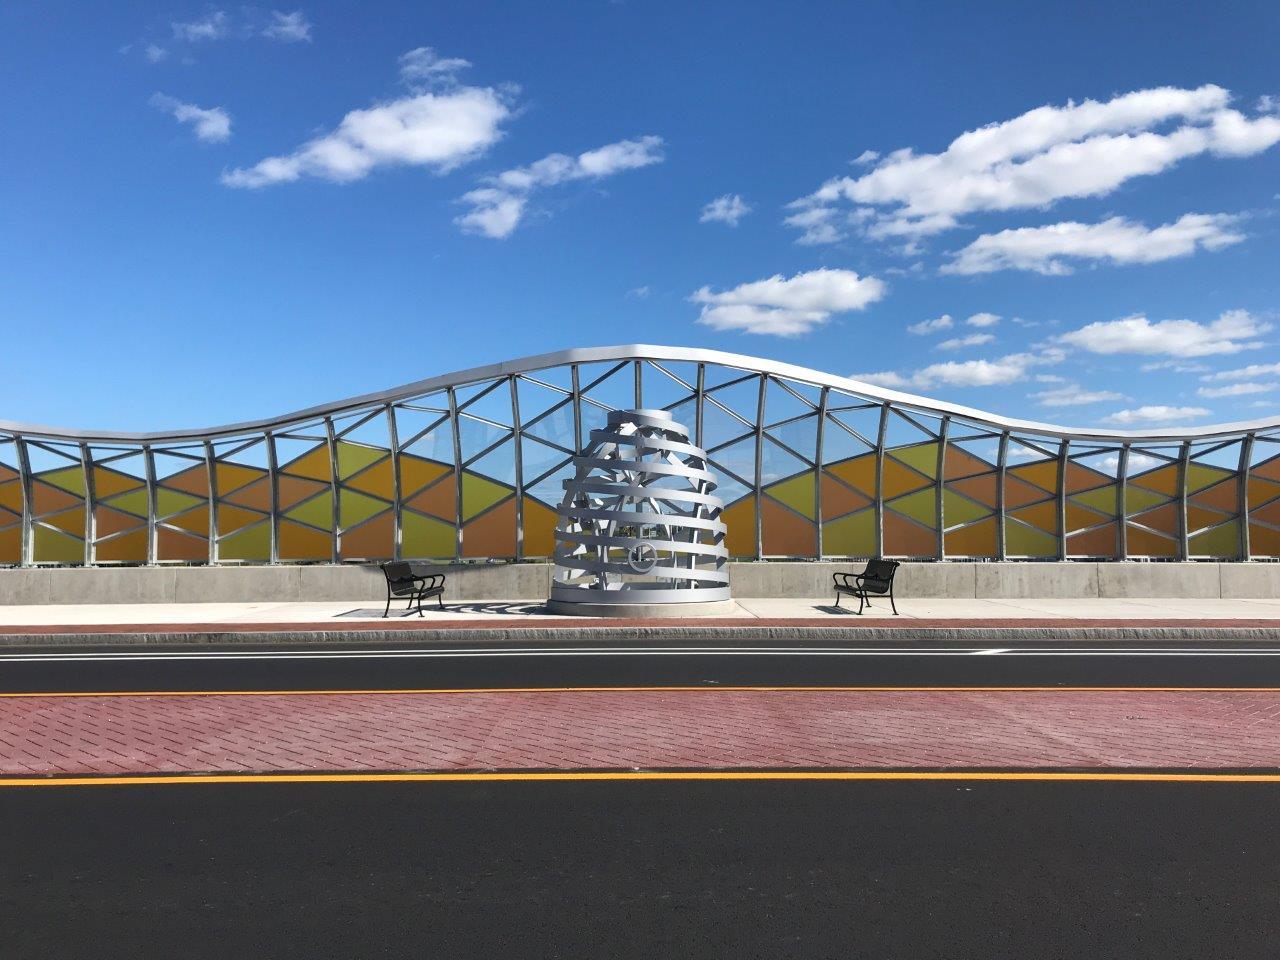 Beehive Bridge – New Britain, CT